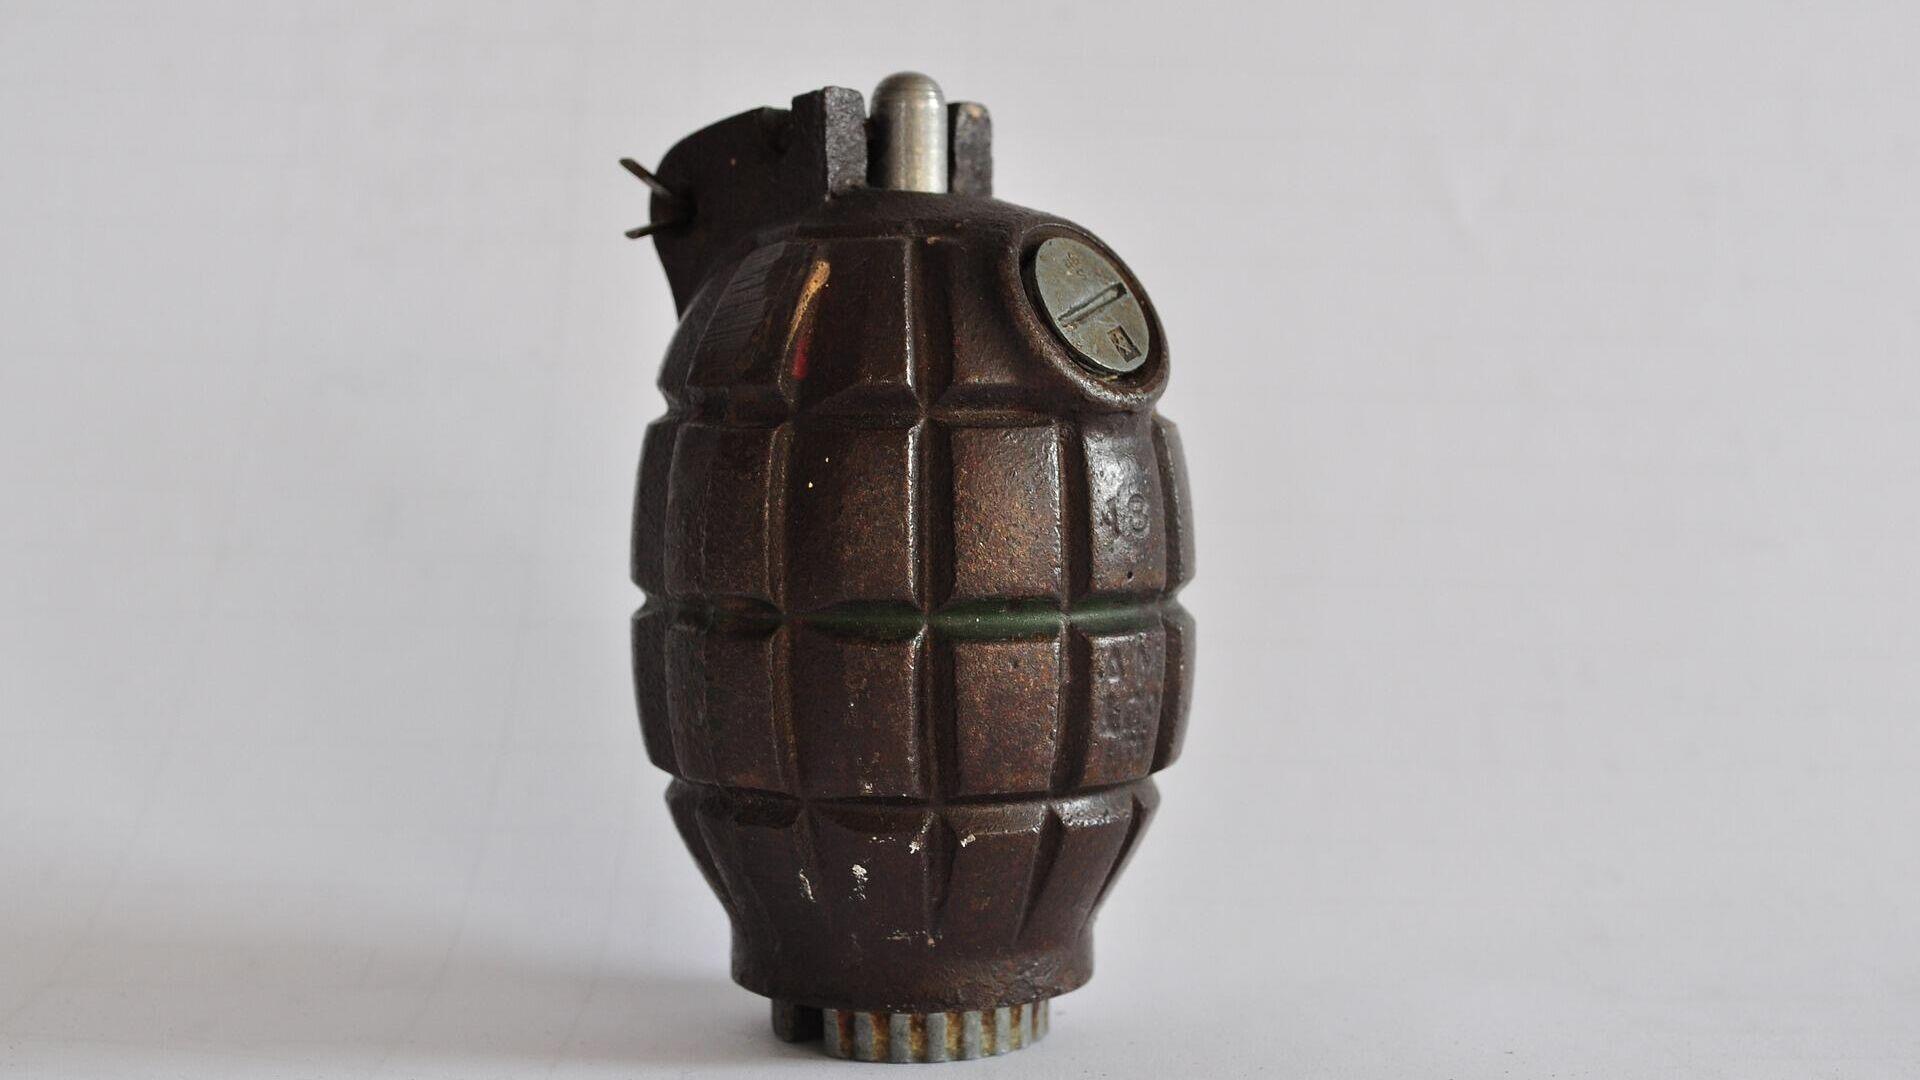 Handgranate (Symbolbild) - SNA, 1920, 27.09.2021